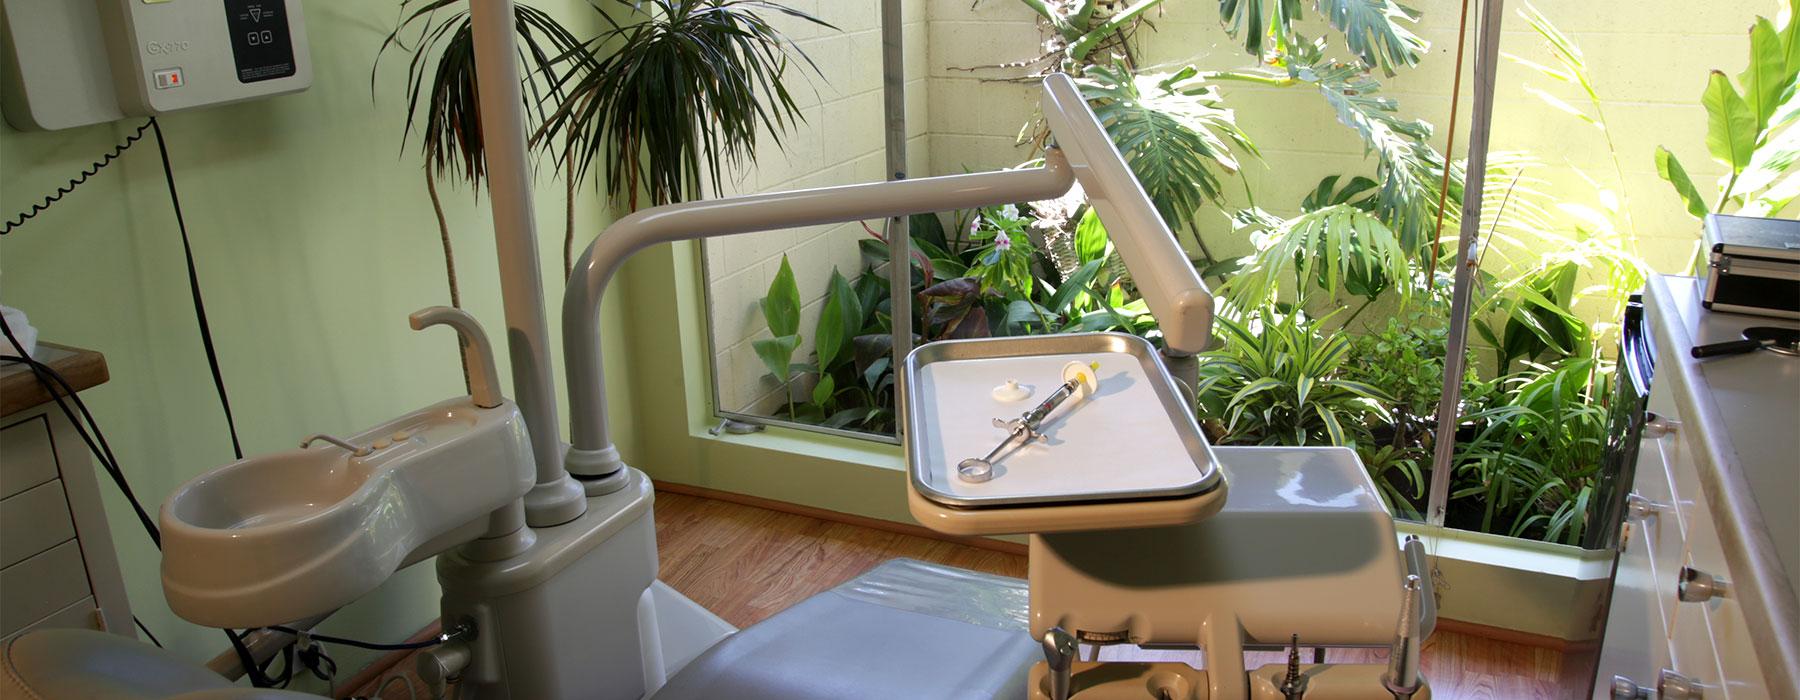 family business story dentist exam room